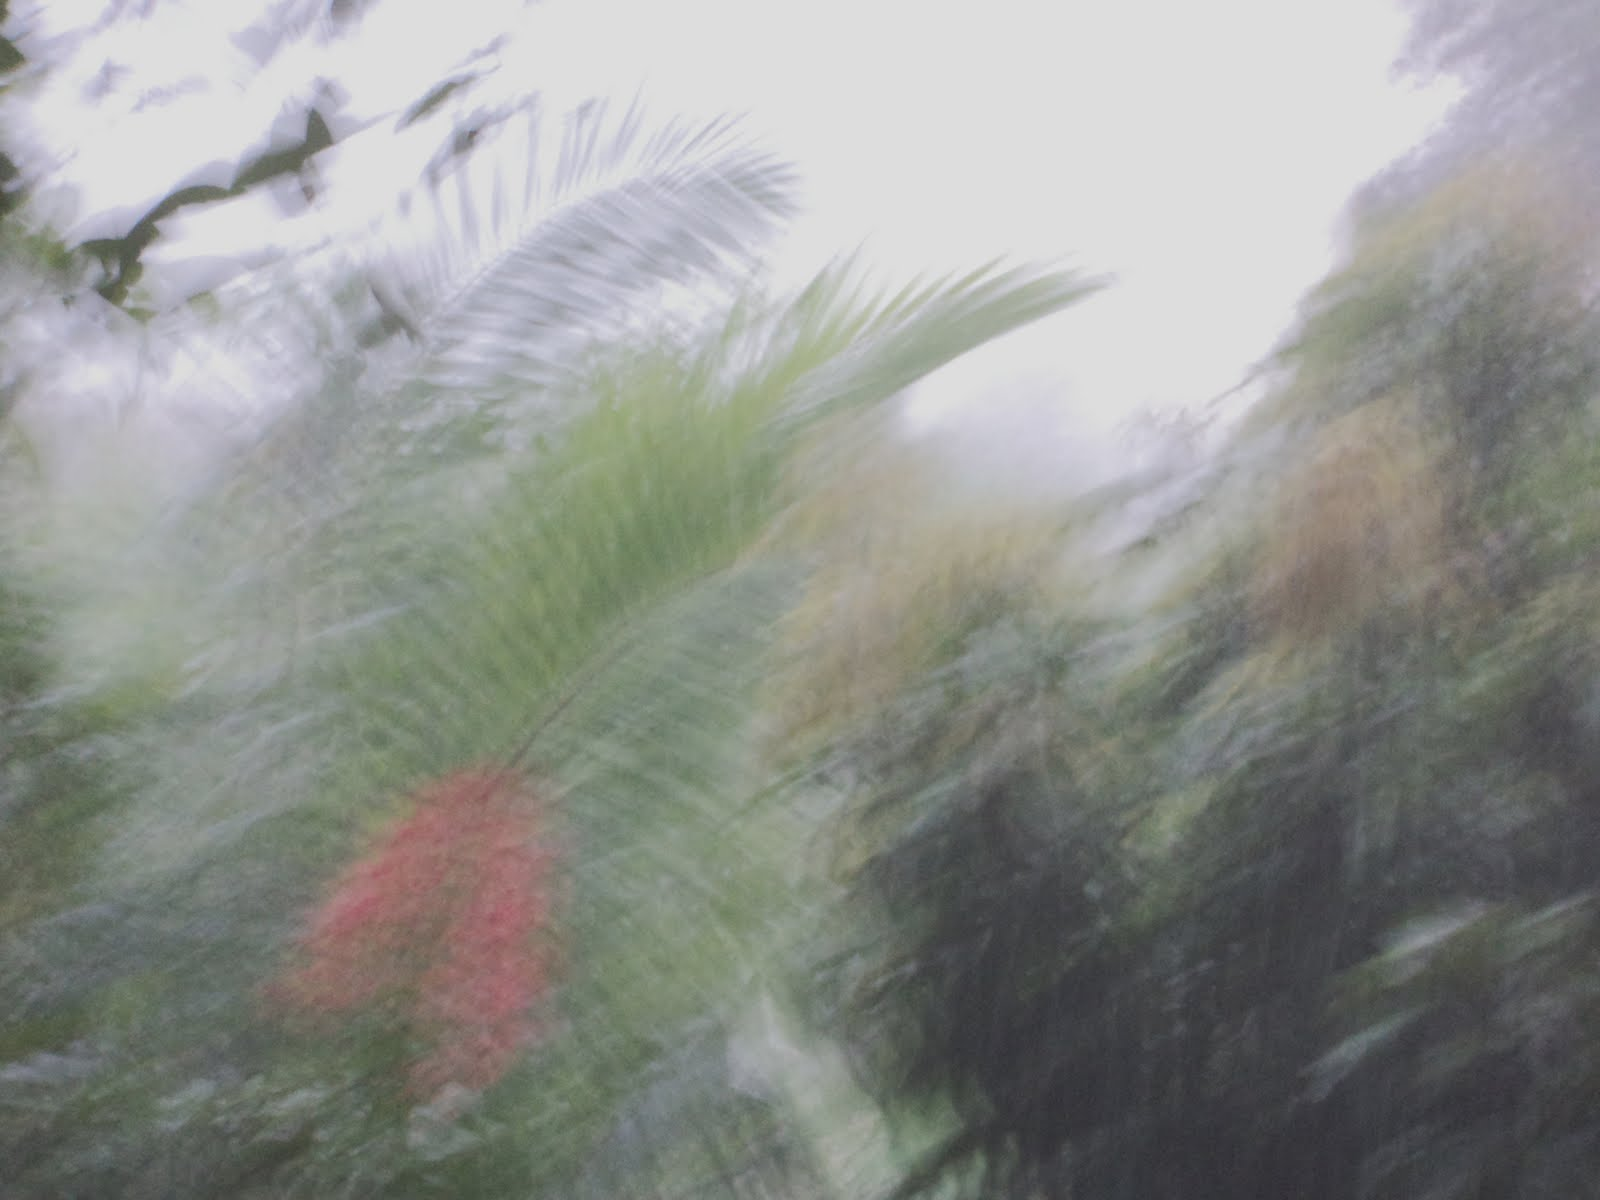 U0026 39 Golf Monsoon System  Haikus For Kids About Summertime